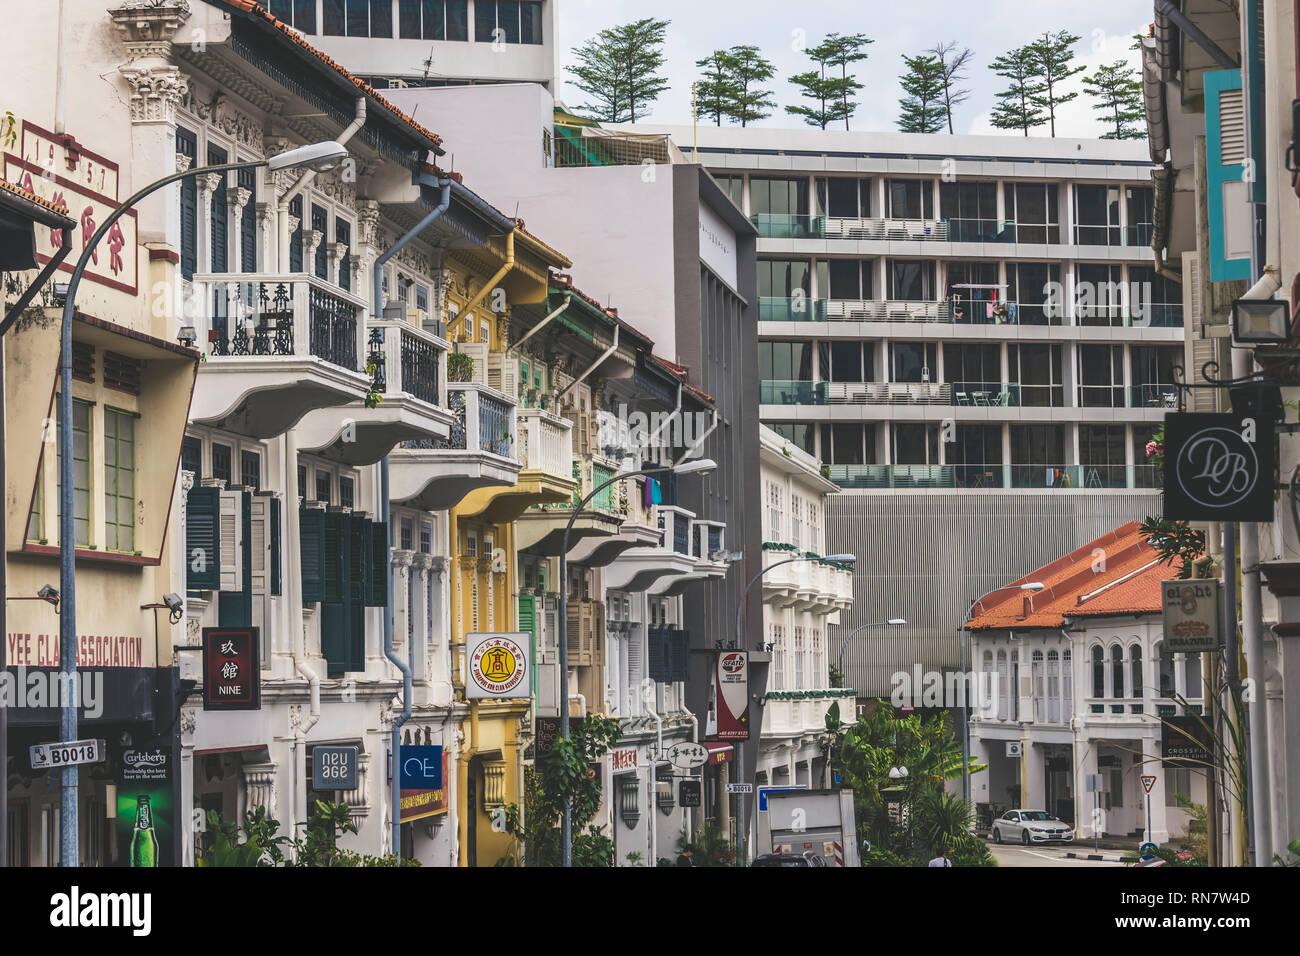 Singapore / Singapore - February 17 2019: Street view of art deco shophouses along Bukit Pasoh Conservation area in elegant muted matt filter - Stock Image